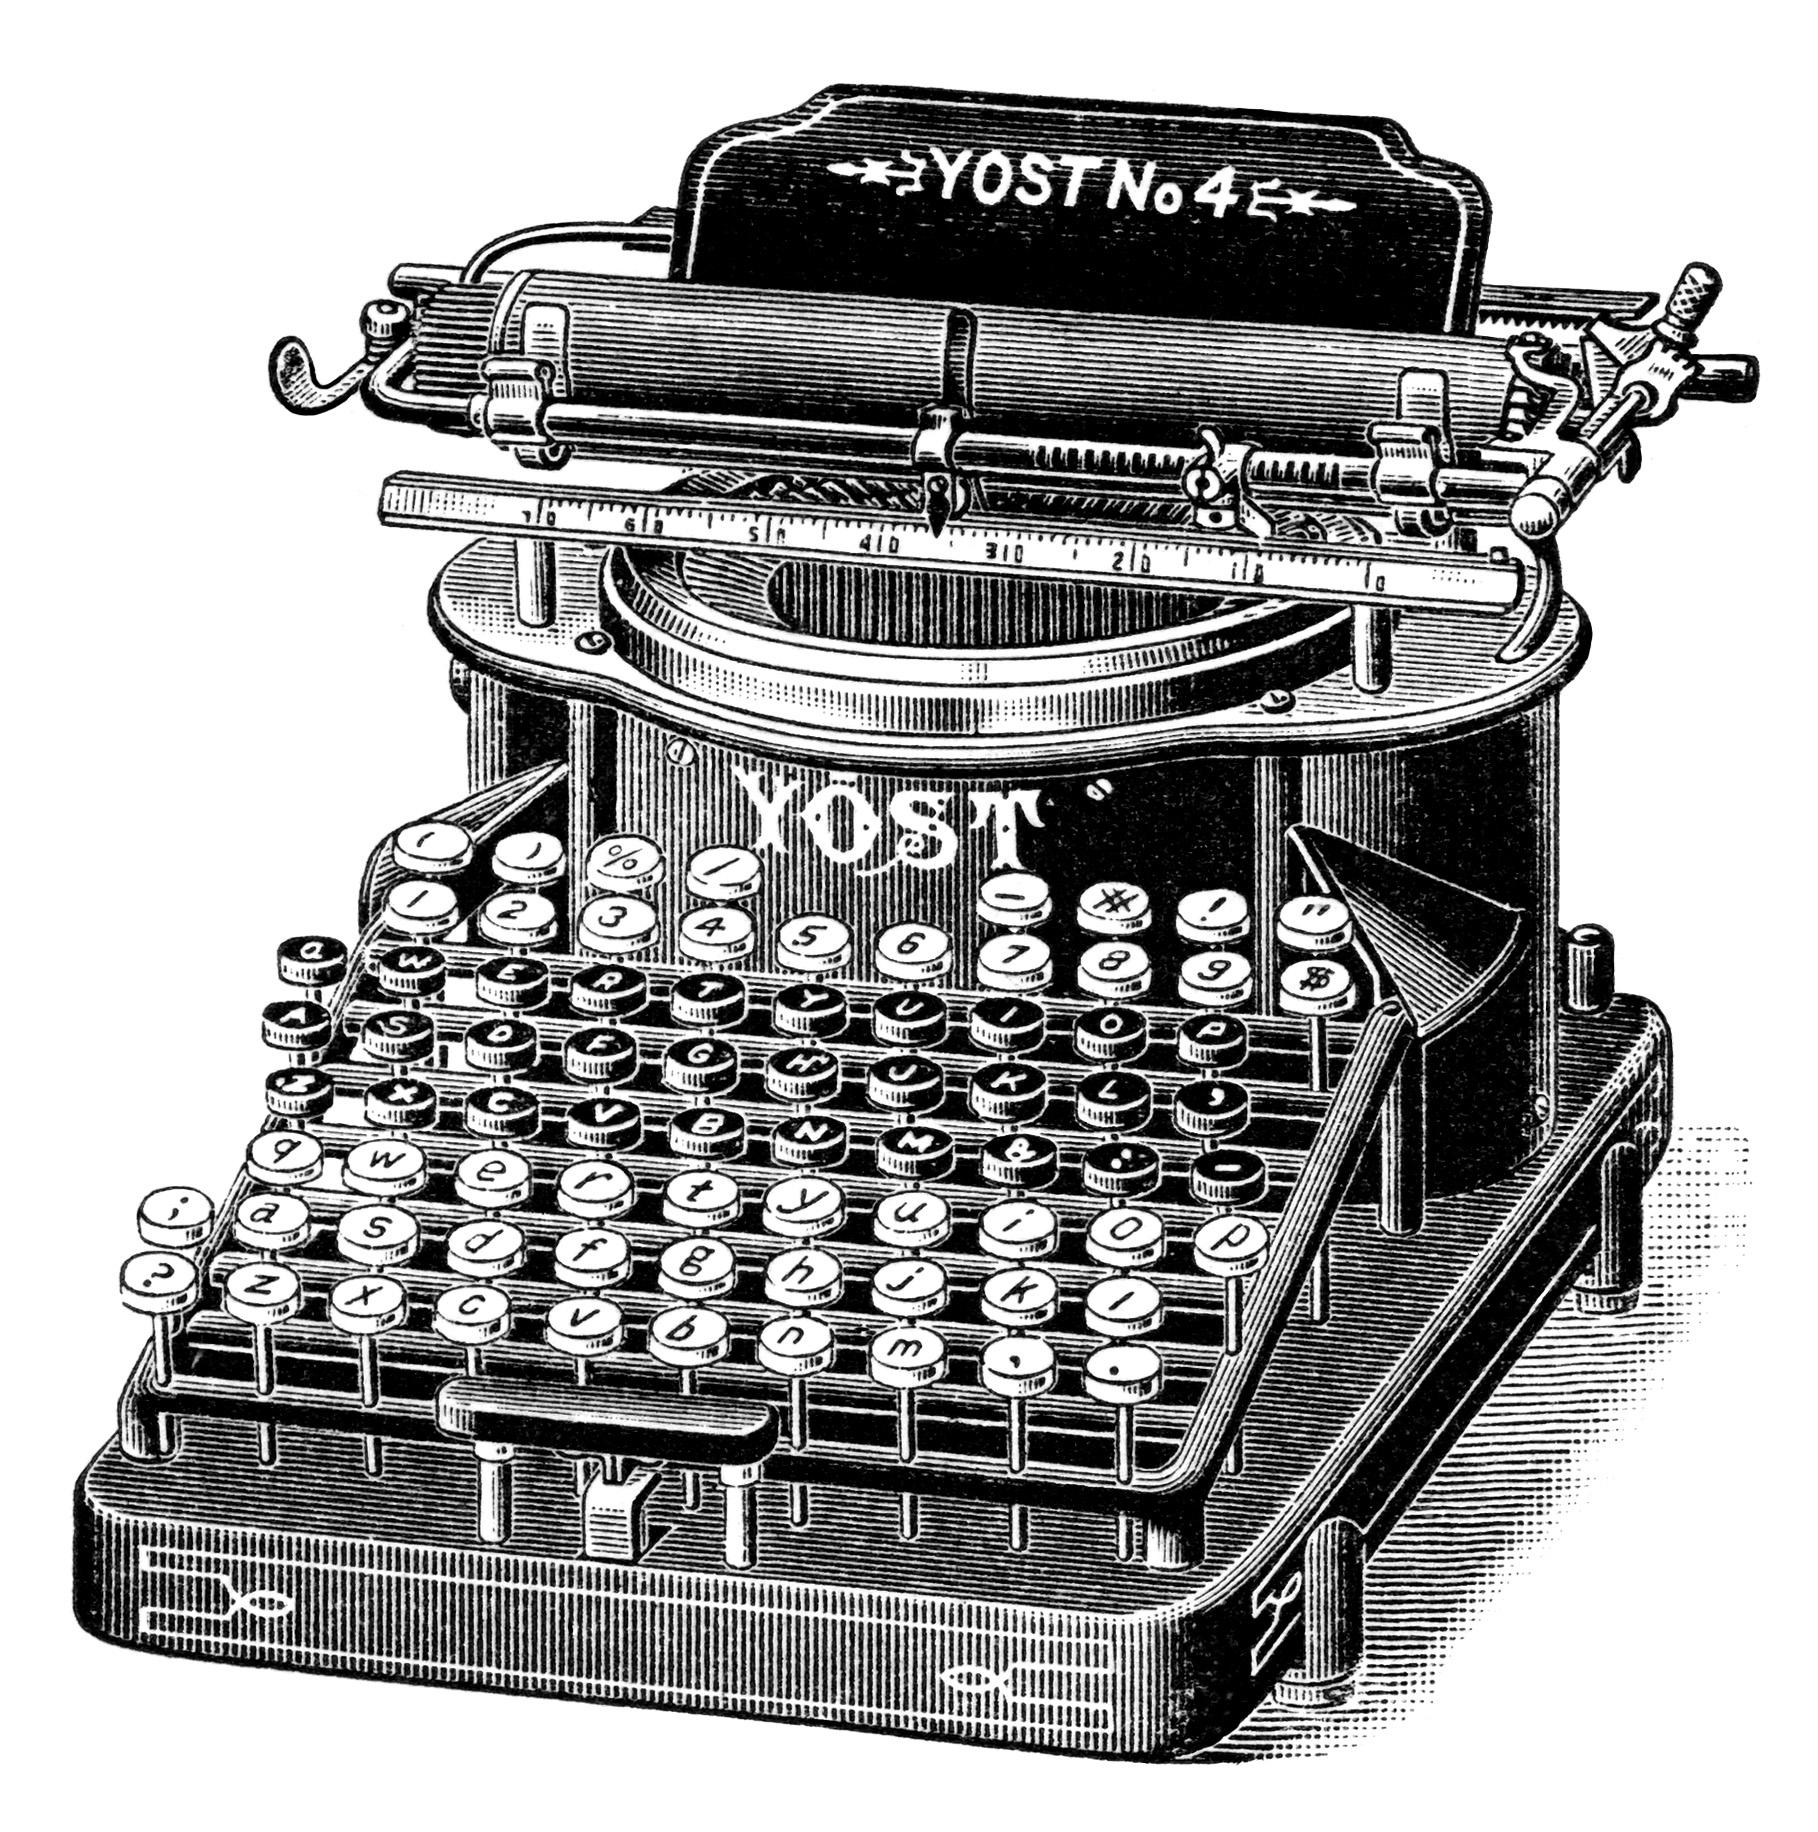 Drawn typewriter Pinterest 54 best images on